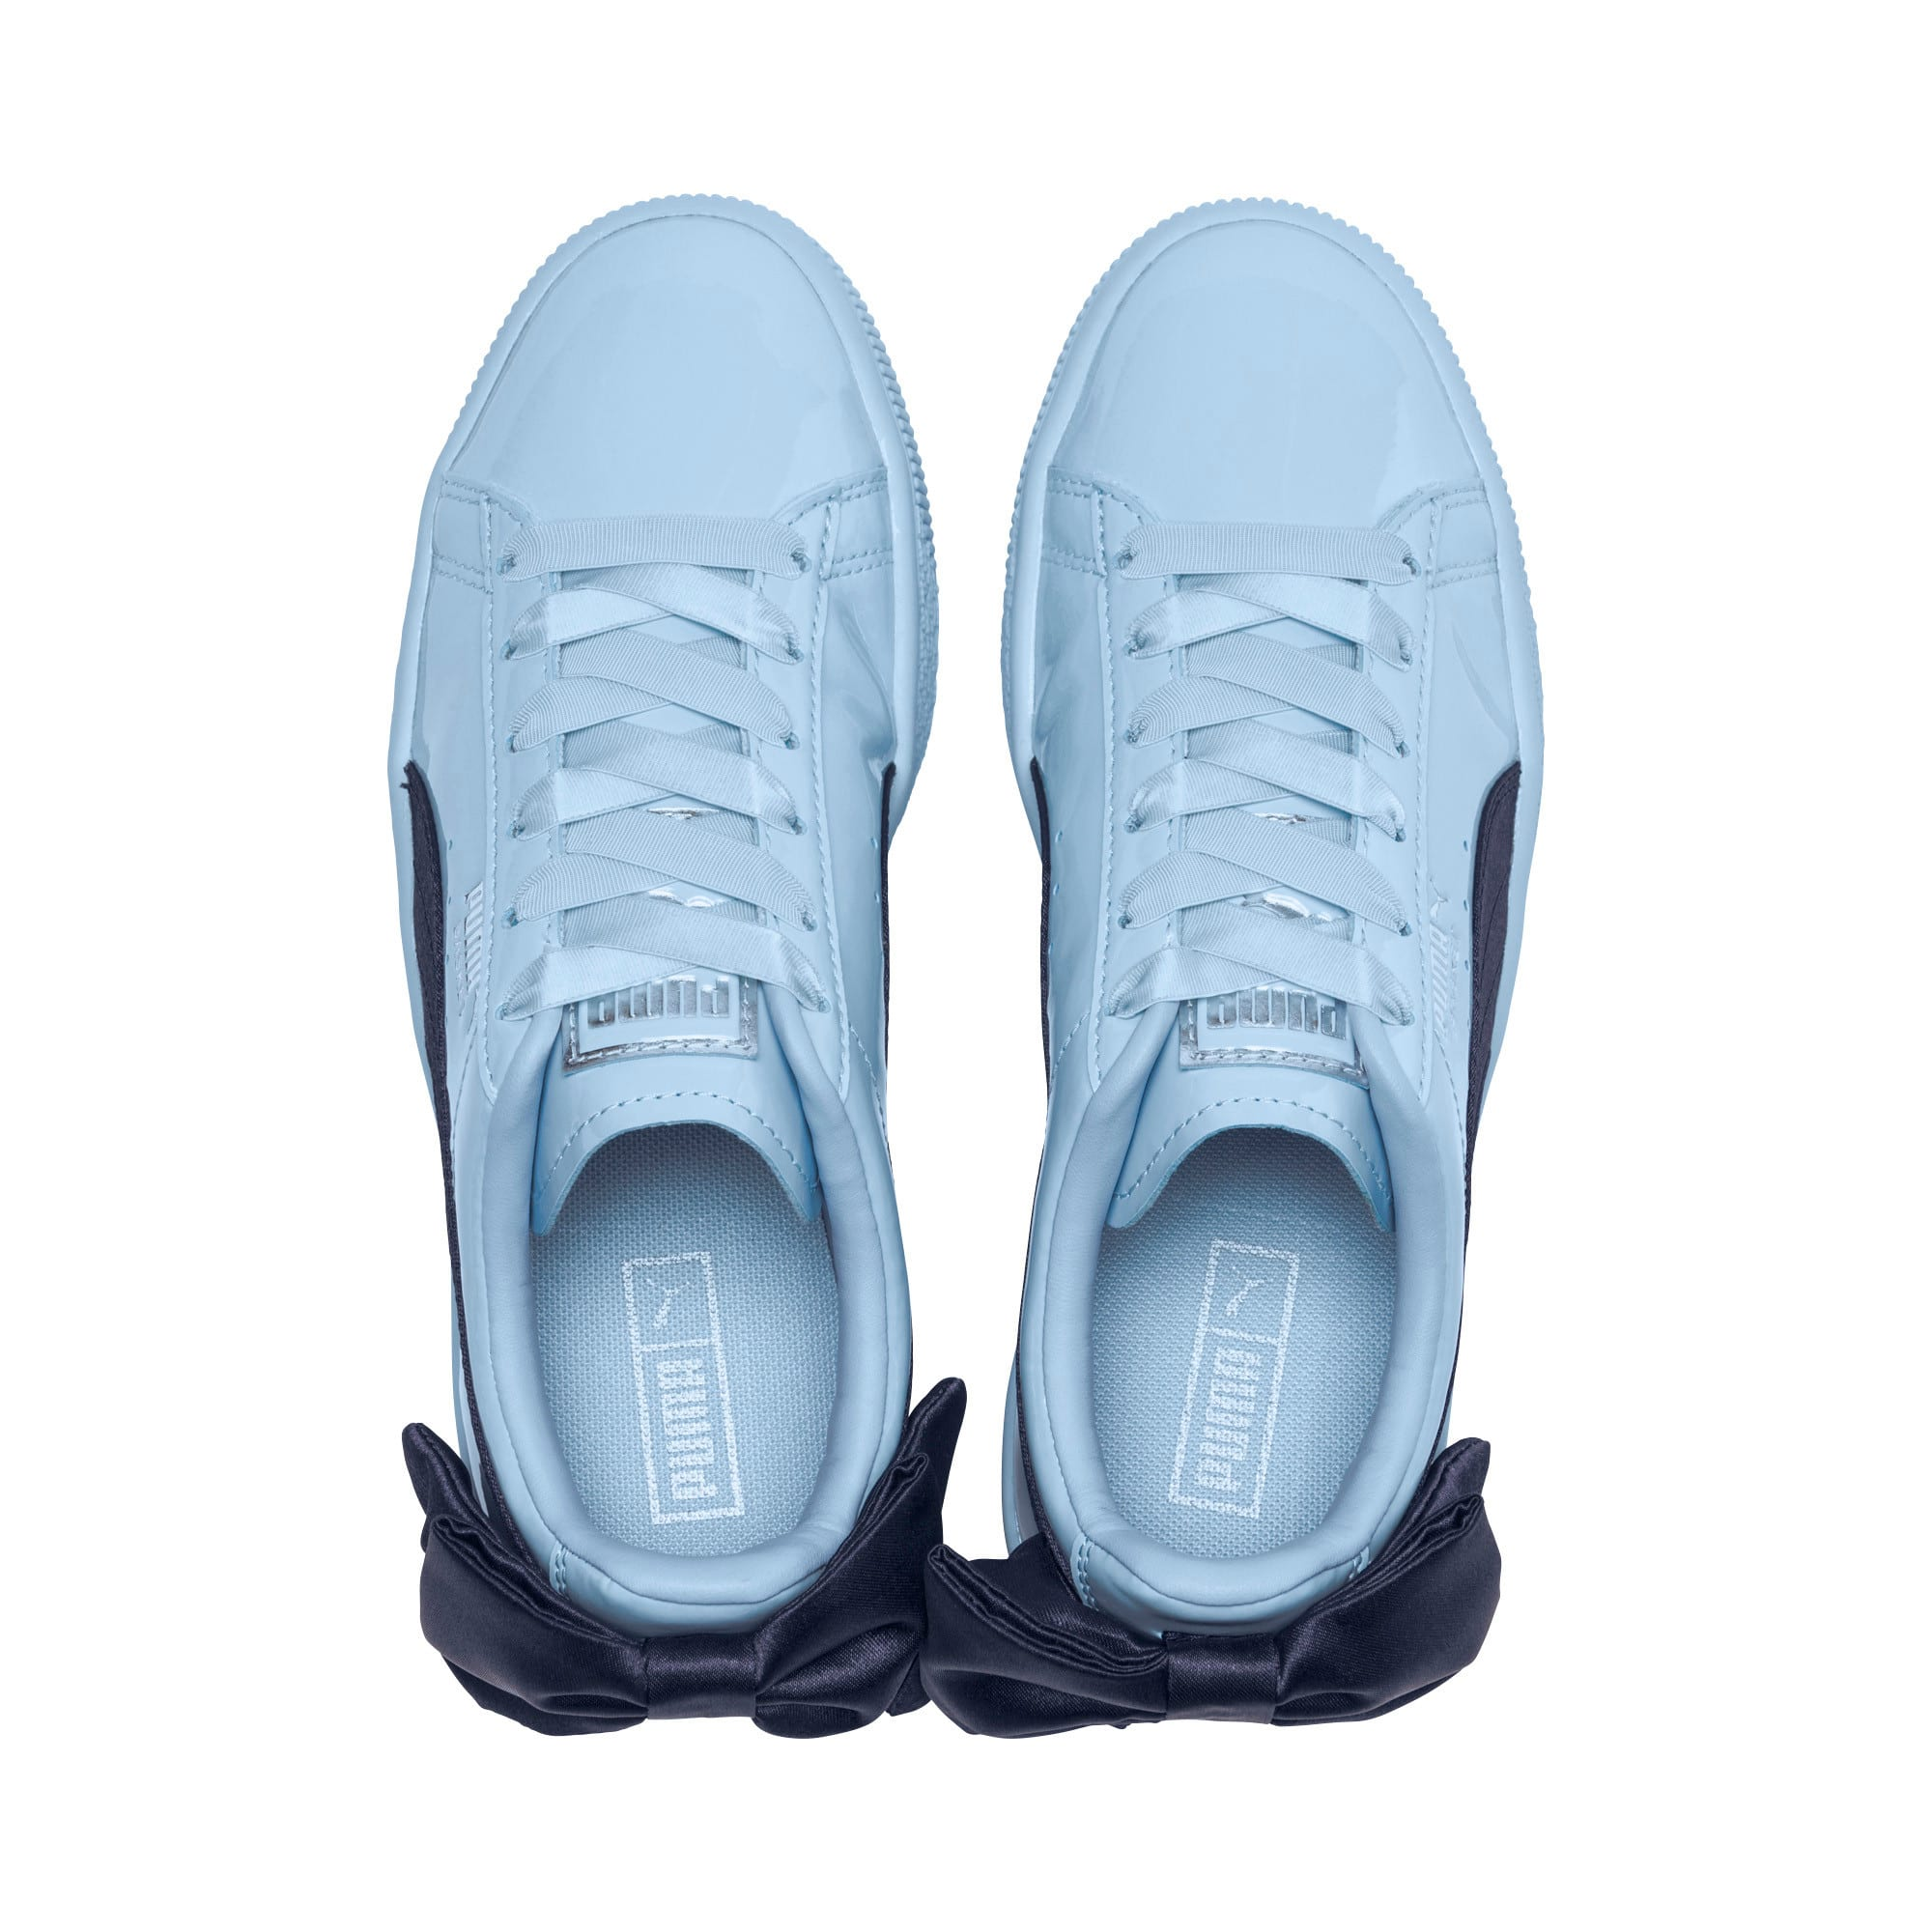 Thumbnail 6 of Basket Bow Patent Sneakers JR, CERULEAN-Peacoat, medium